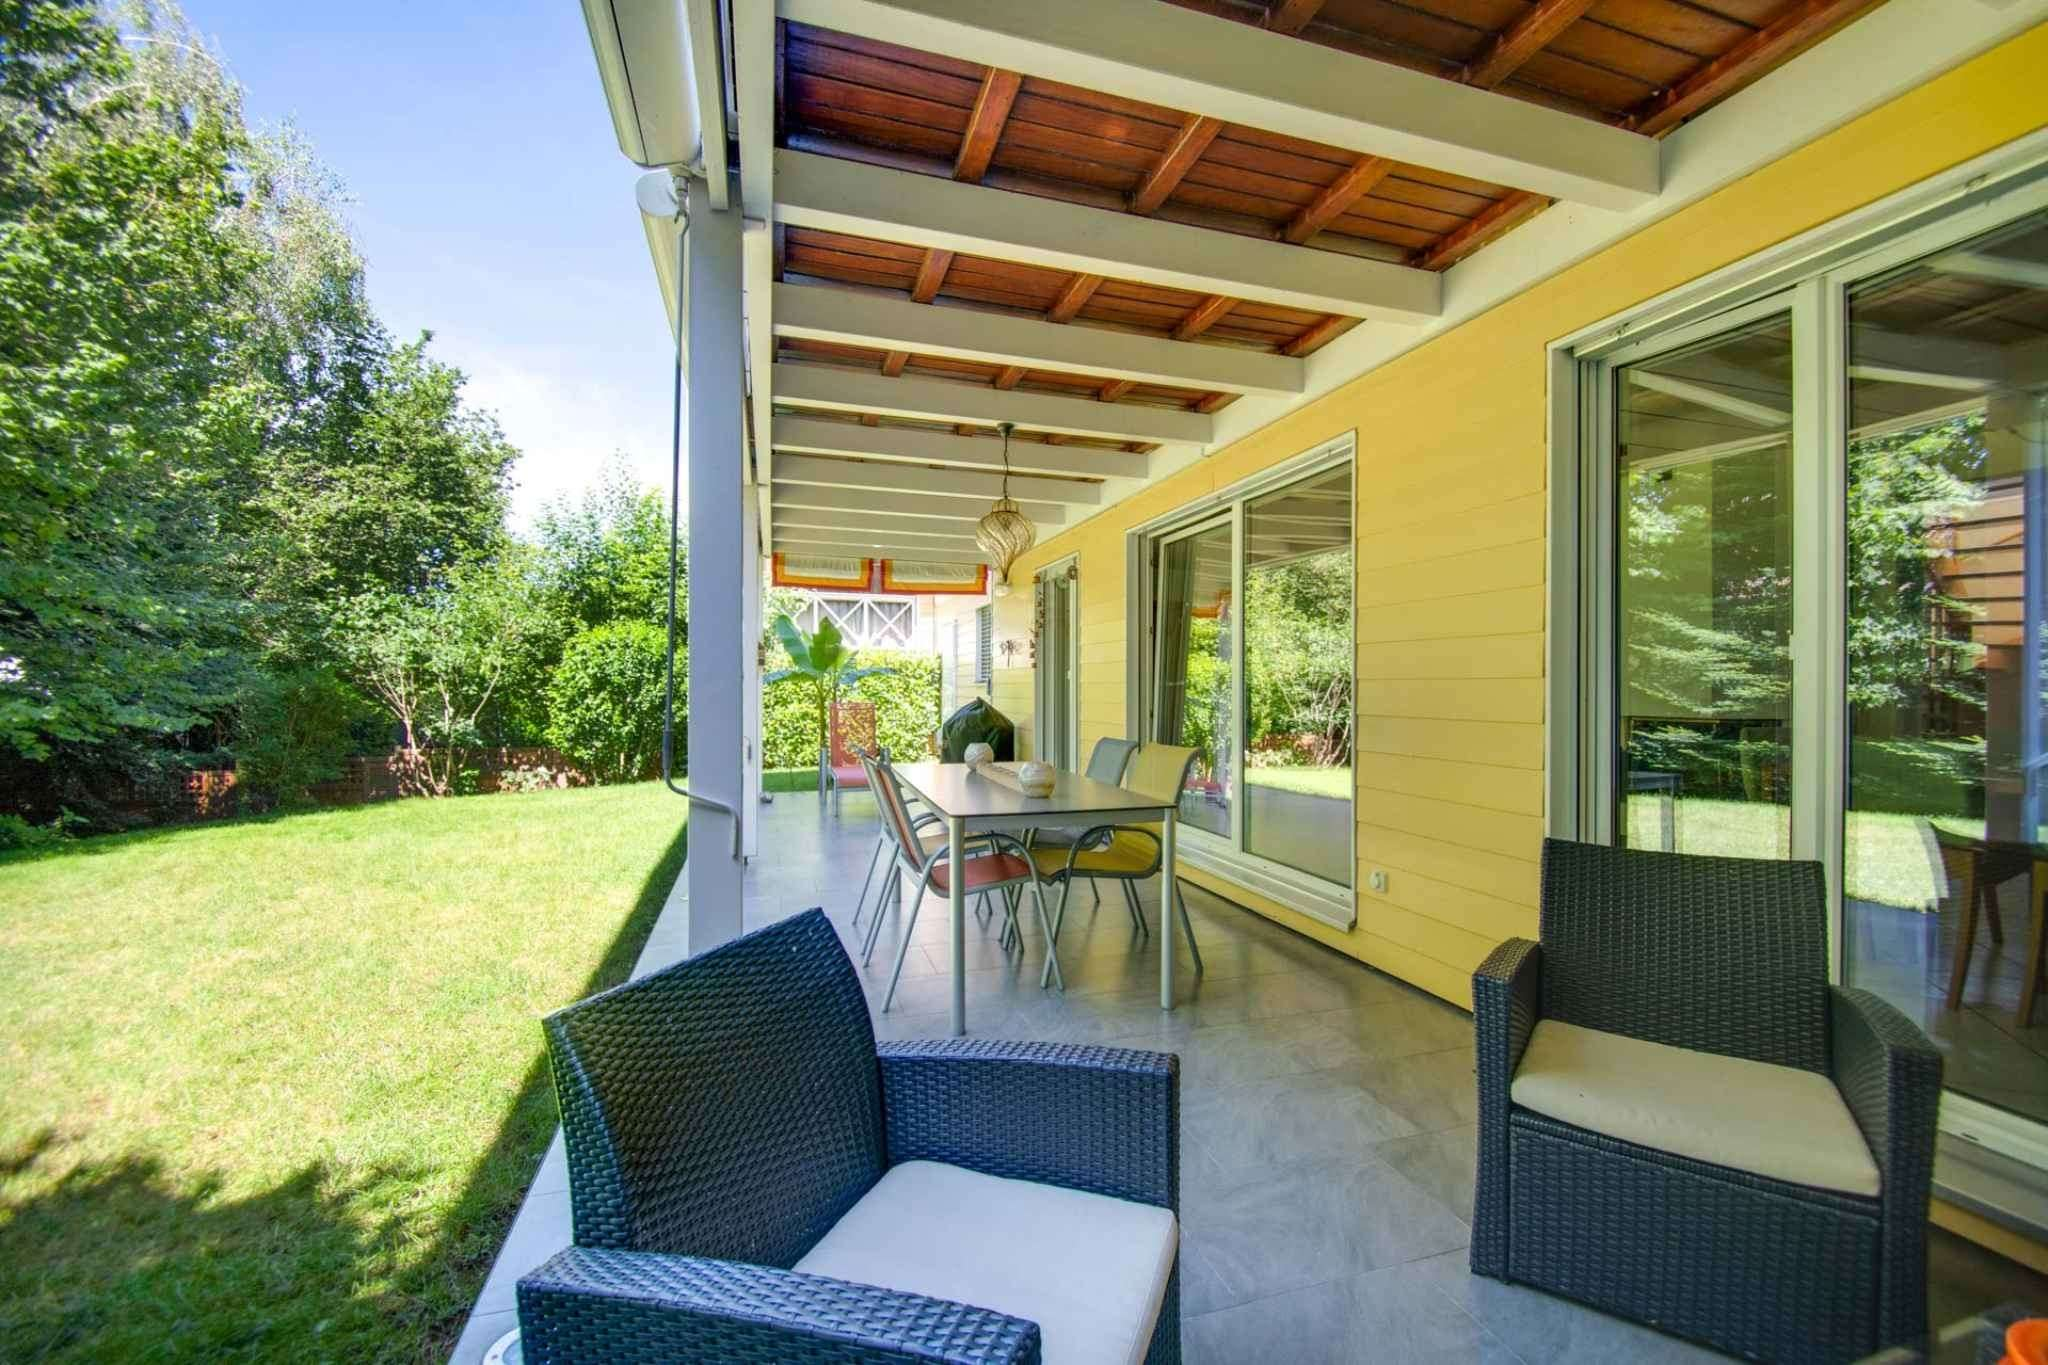 Corsier : Villa avec beau jardin